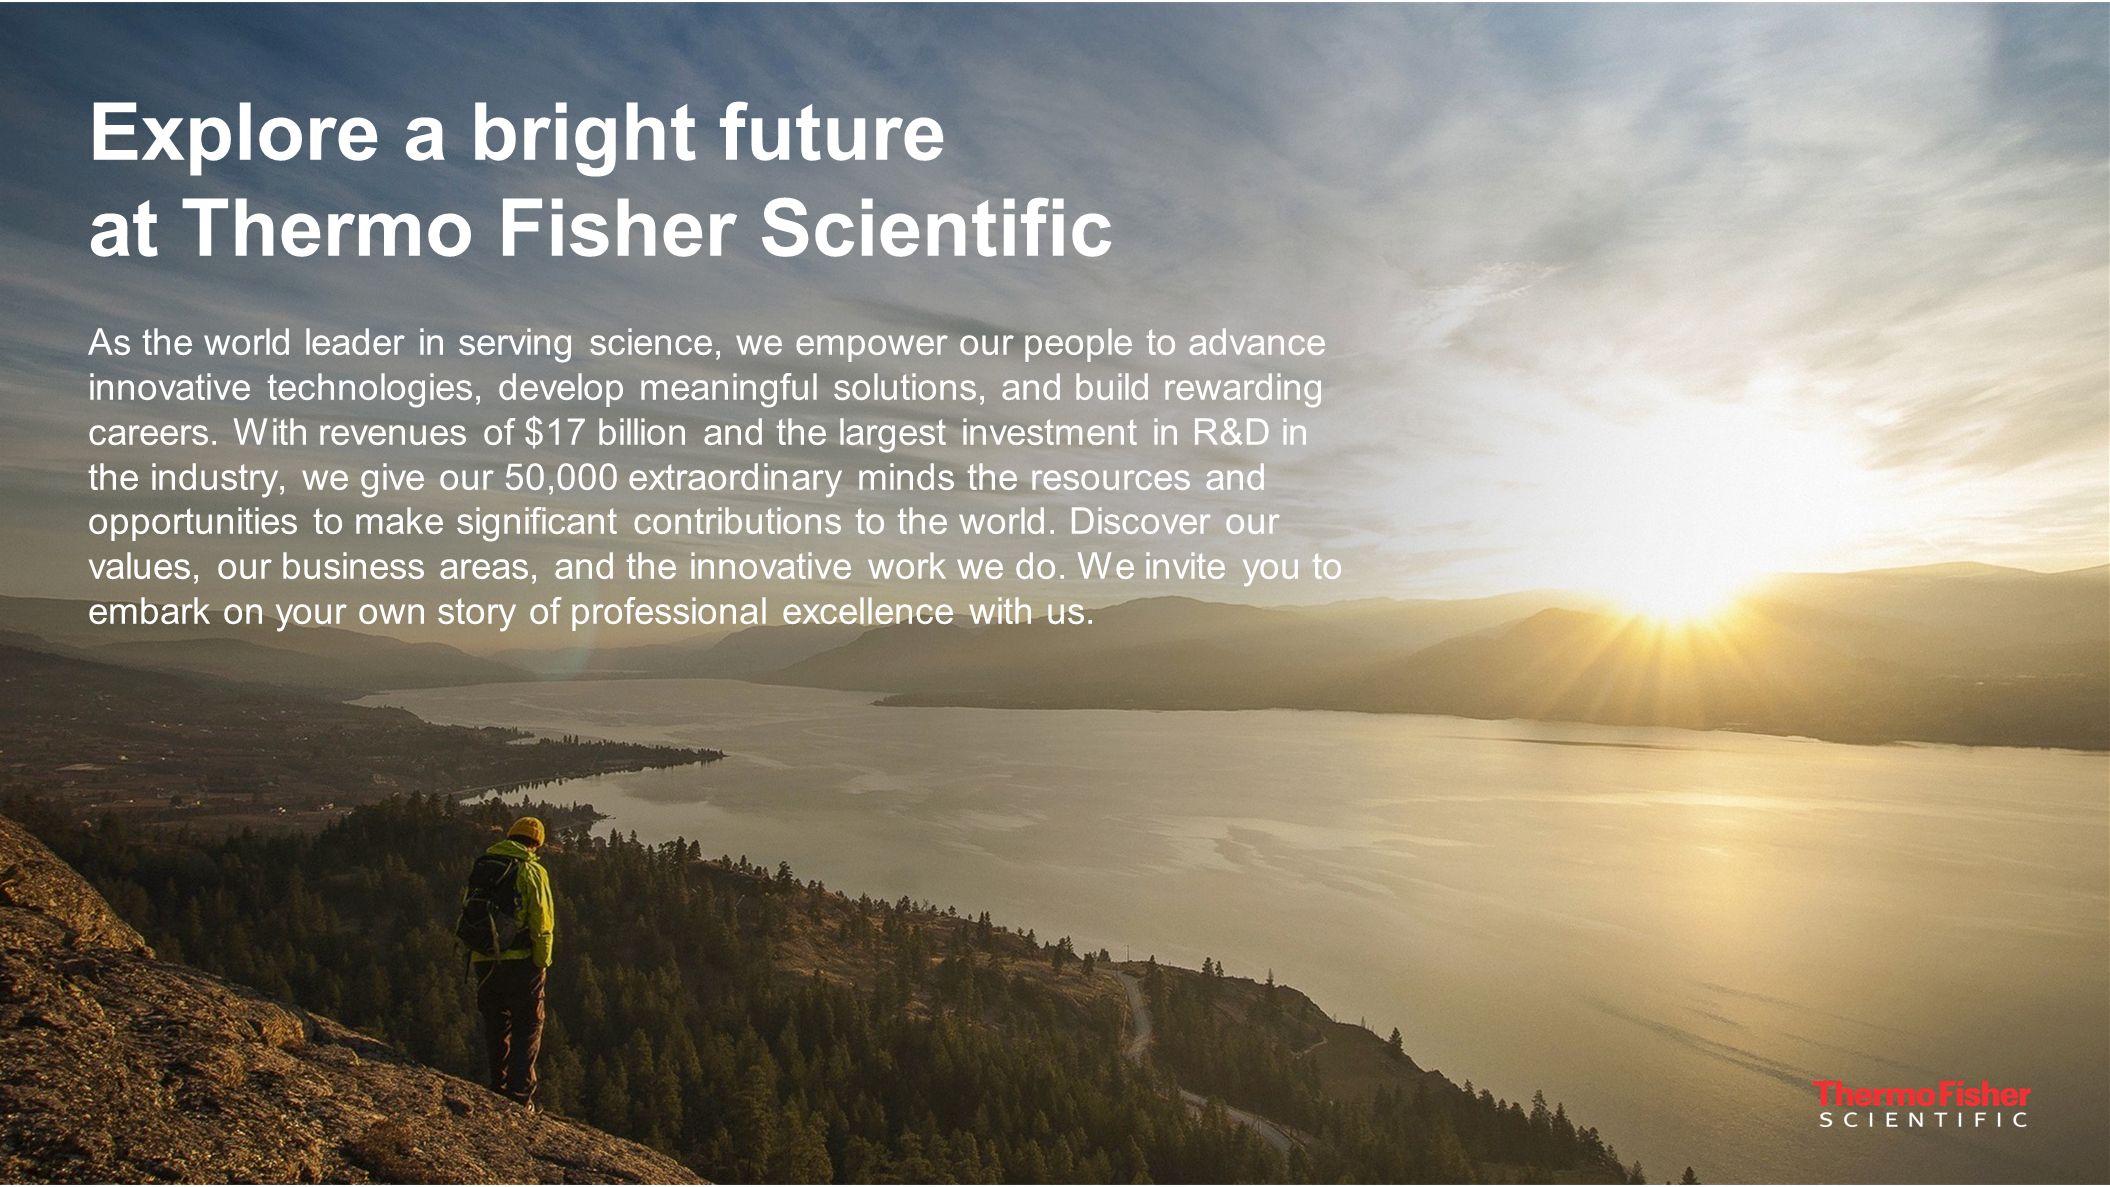 Company Overview Talent Acquisition  Explore a bright future at